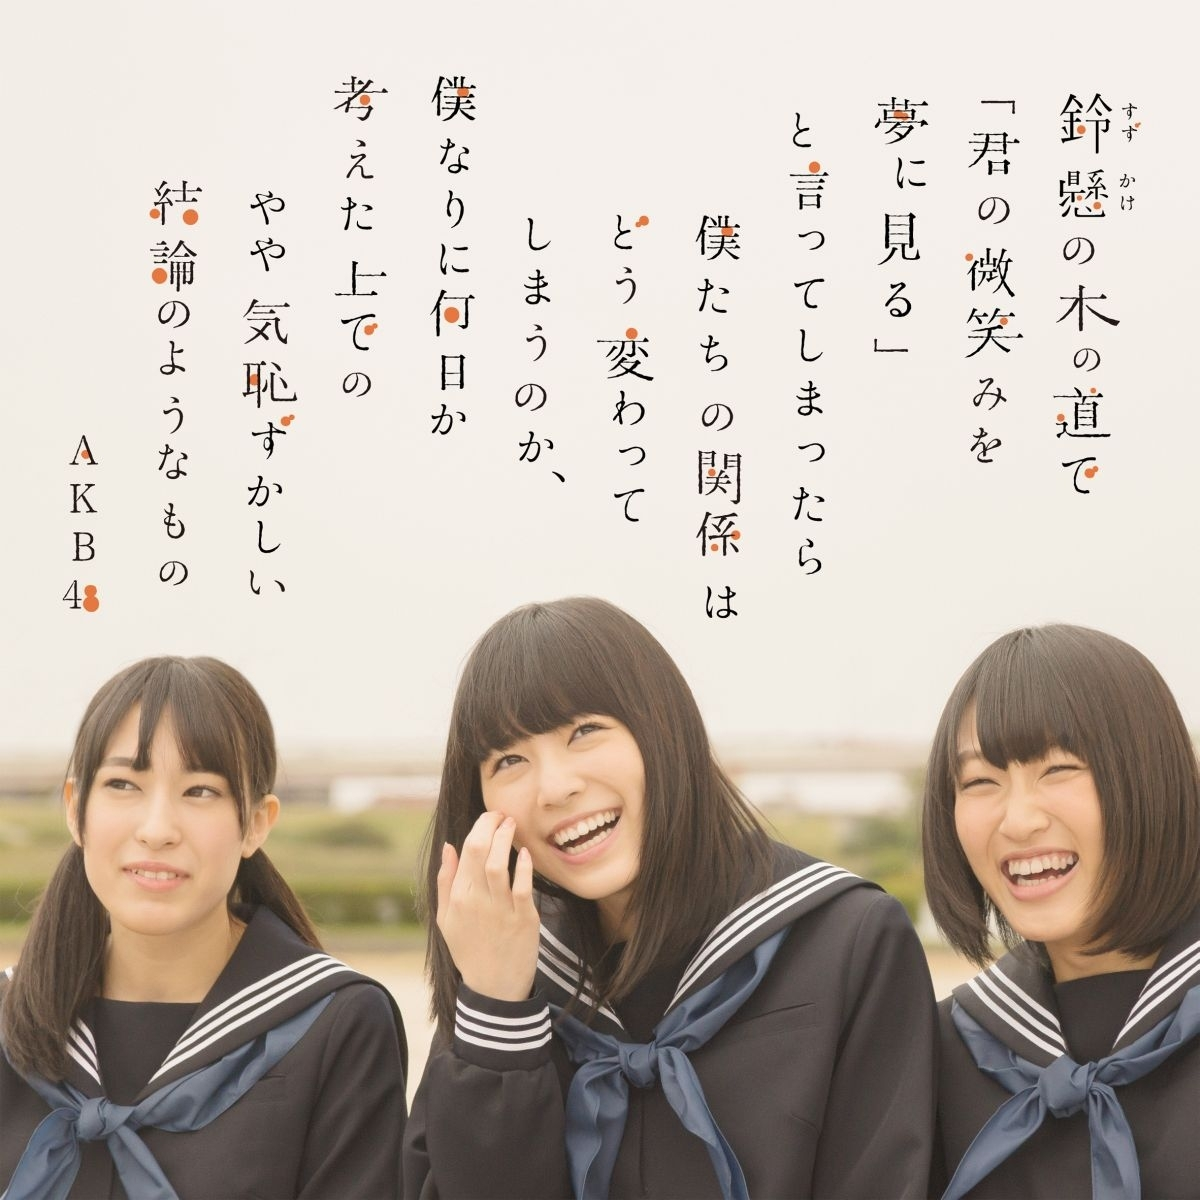 AKB48-鈴懸の木の道で「君の微笑みを夢に見る」と言ってしまったら僕たちの関係はどう変わってしまうのか、僕なりに何日か考えた上でのやや気恥ずかしい結論のようなもの_mp3bst.com